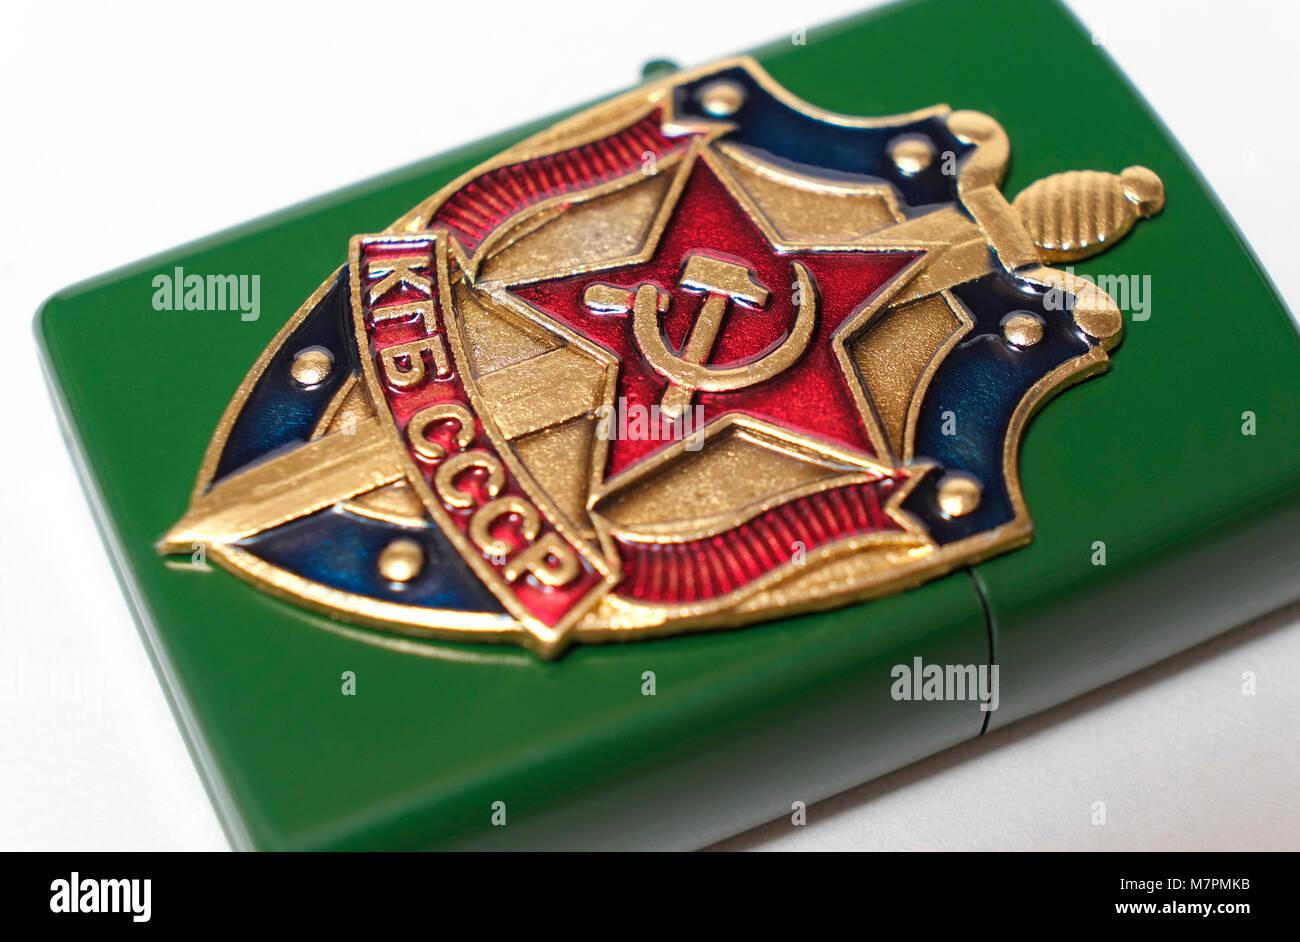 russian kgb badge on metal cigarette lighter - Stock Image